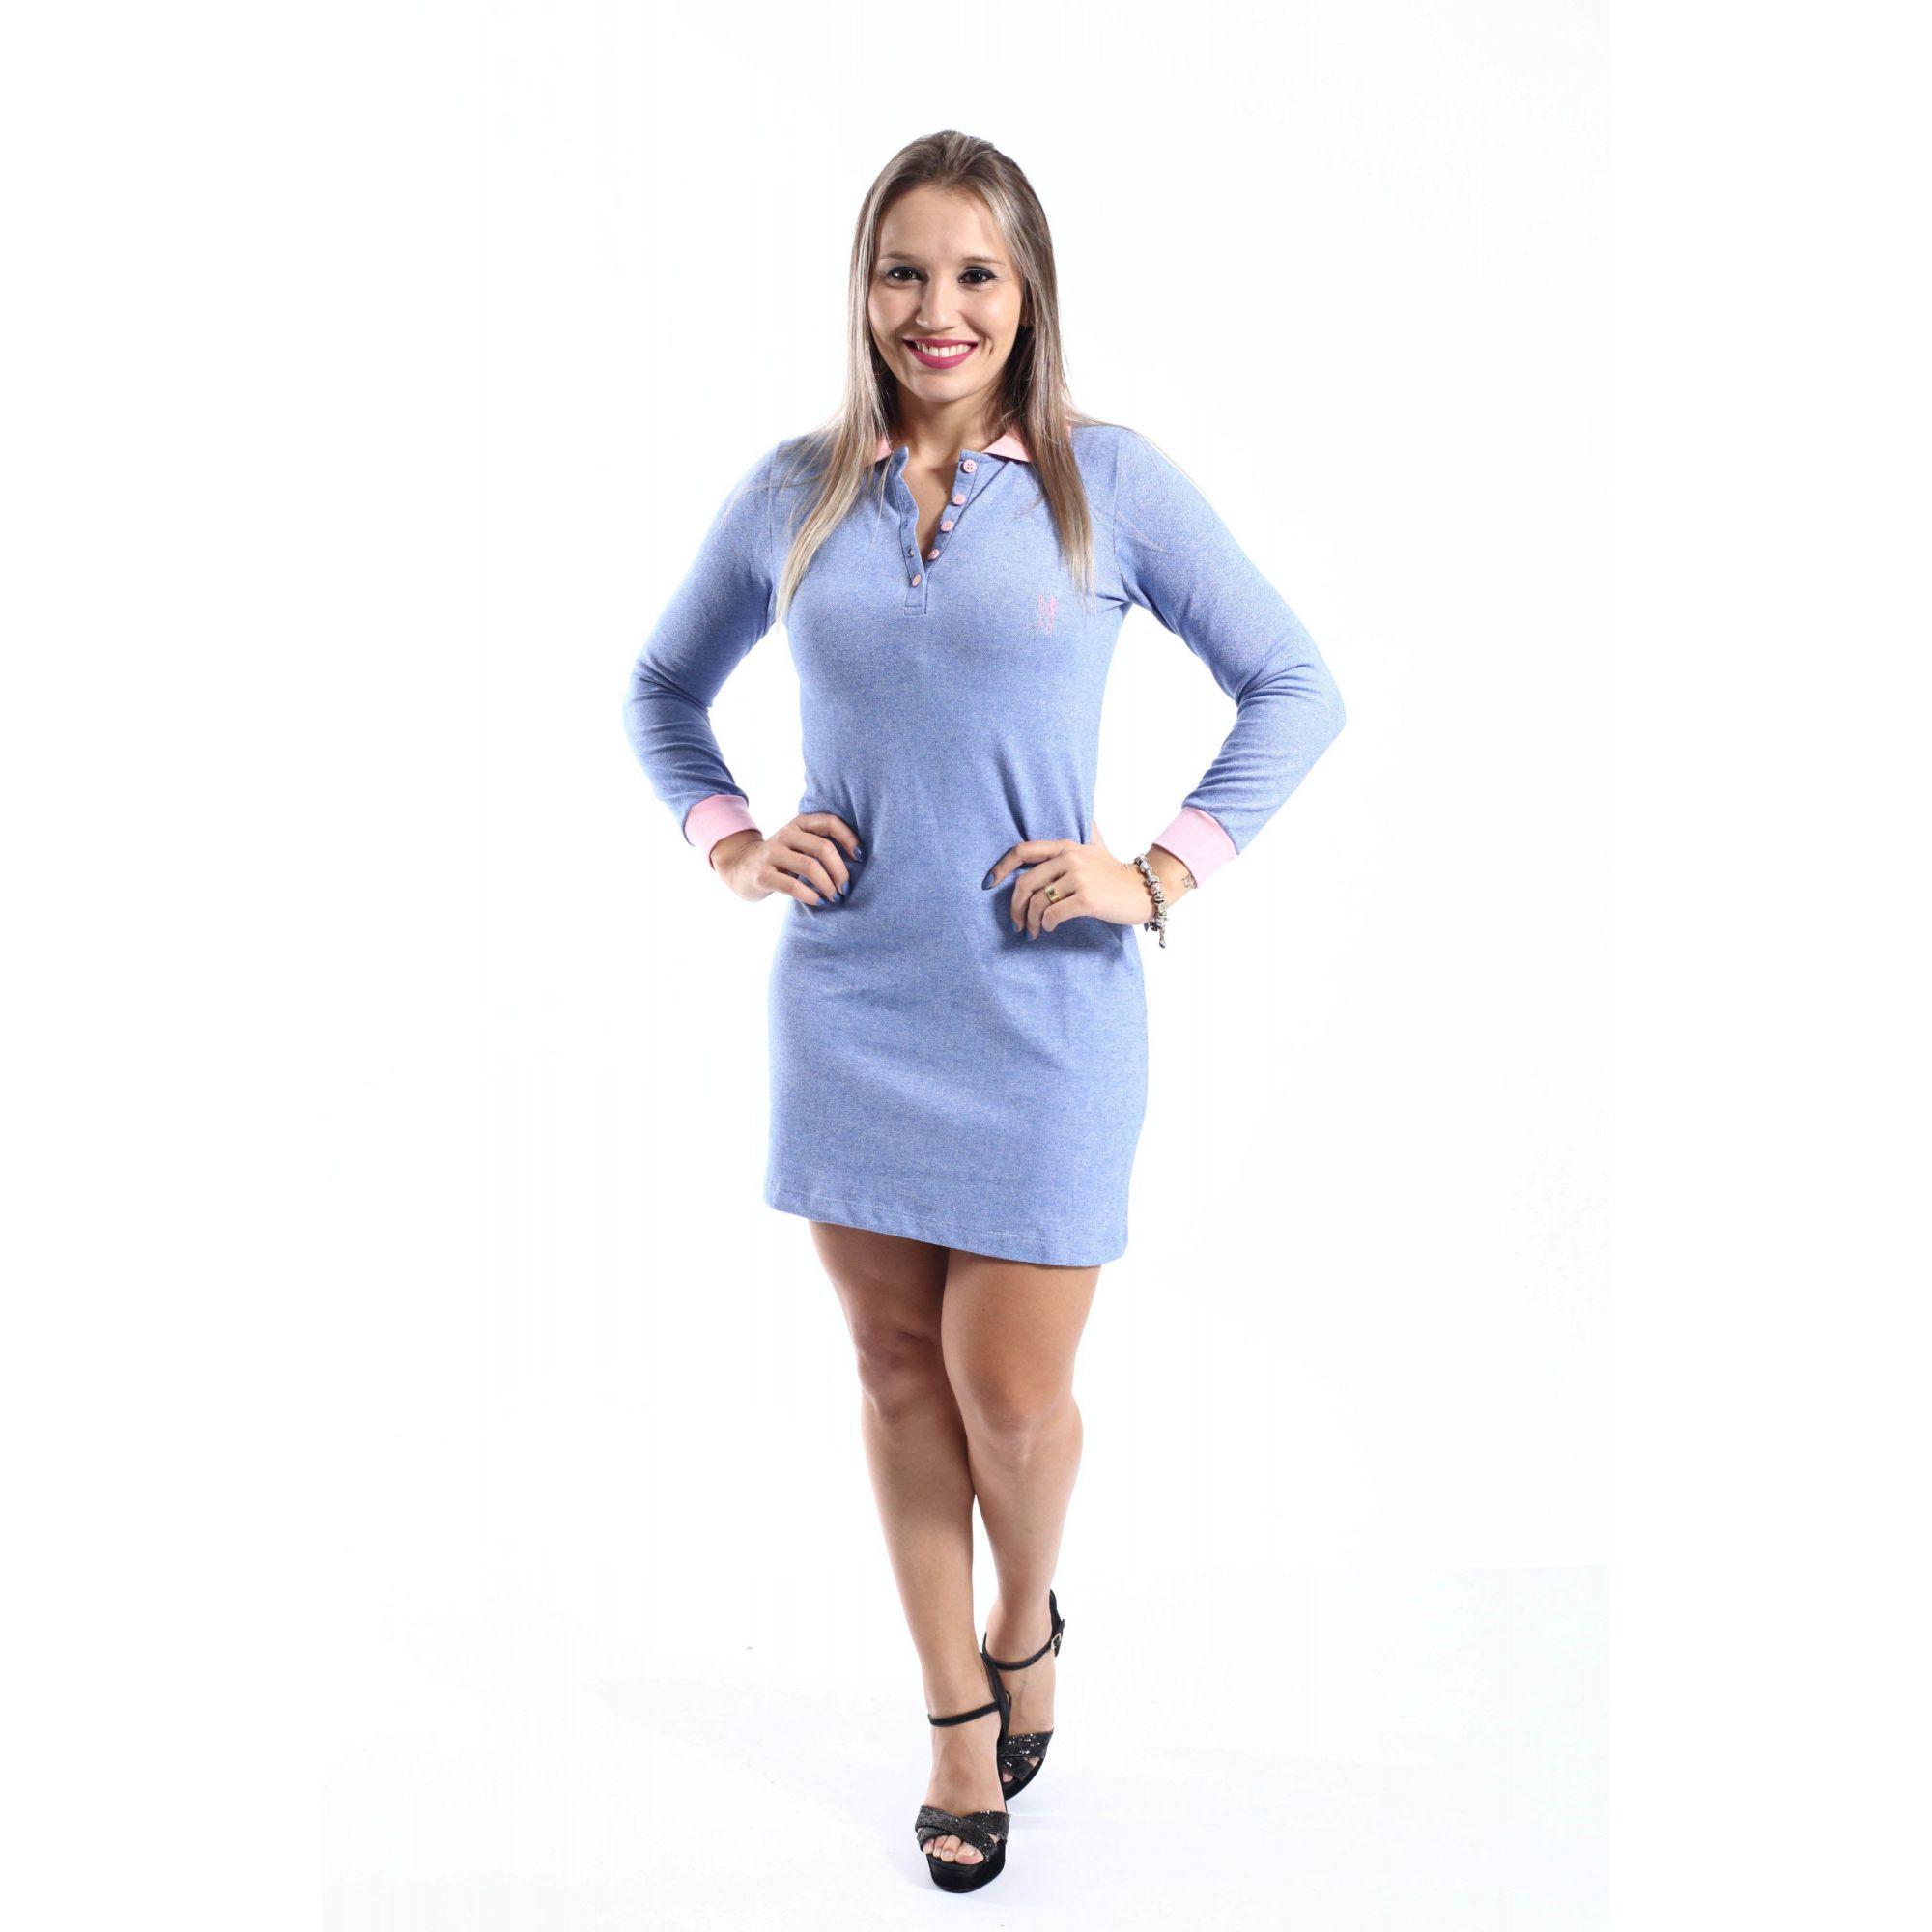 MÃE E FILHA > Kit 02 Vestidos Azuis Manga Longa [Coleção Tal Mãe Tal Filha]  - Heitor Fashion Brazil